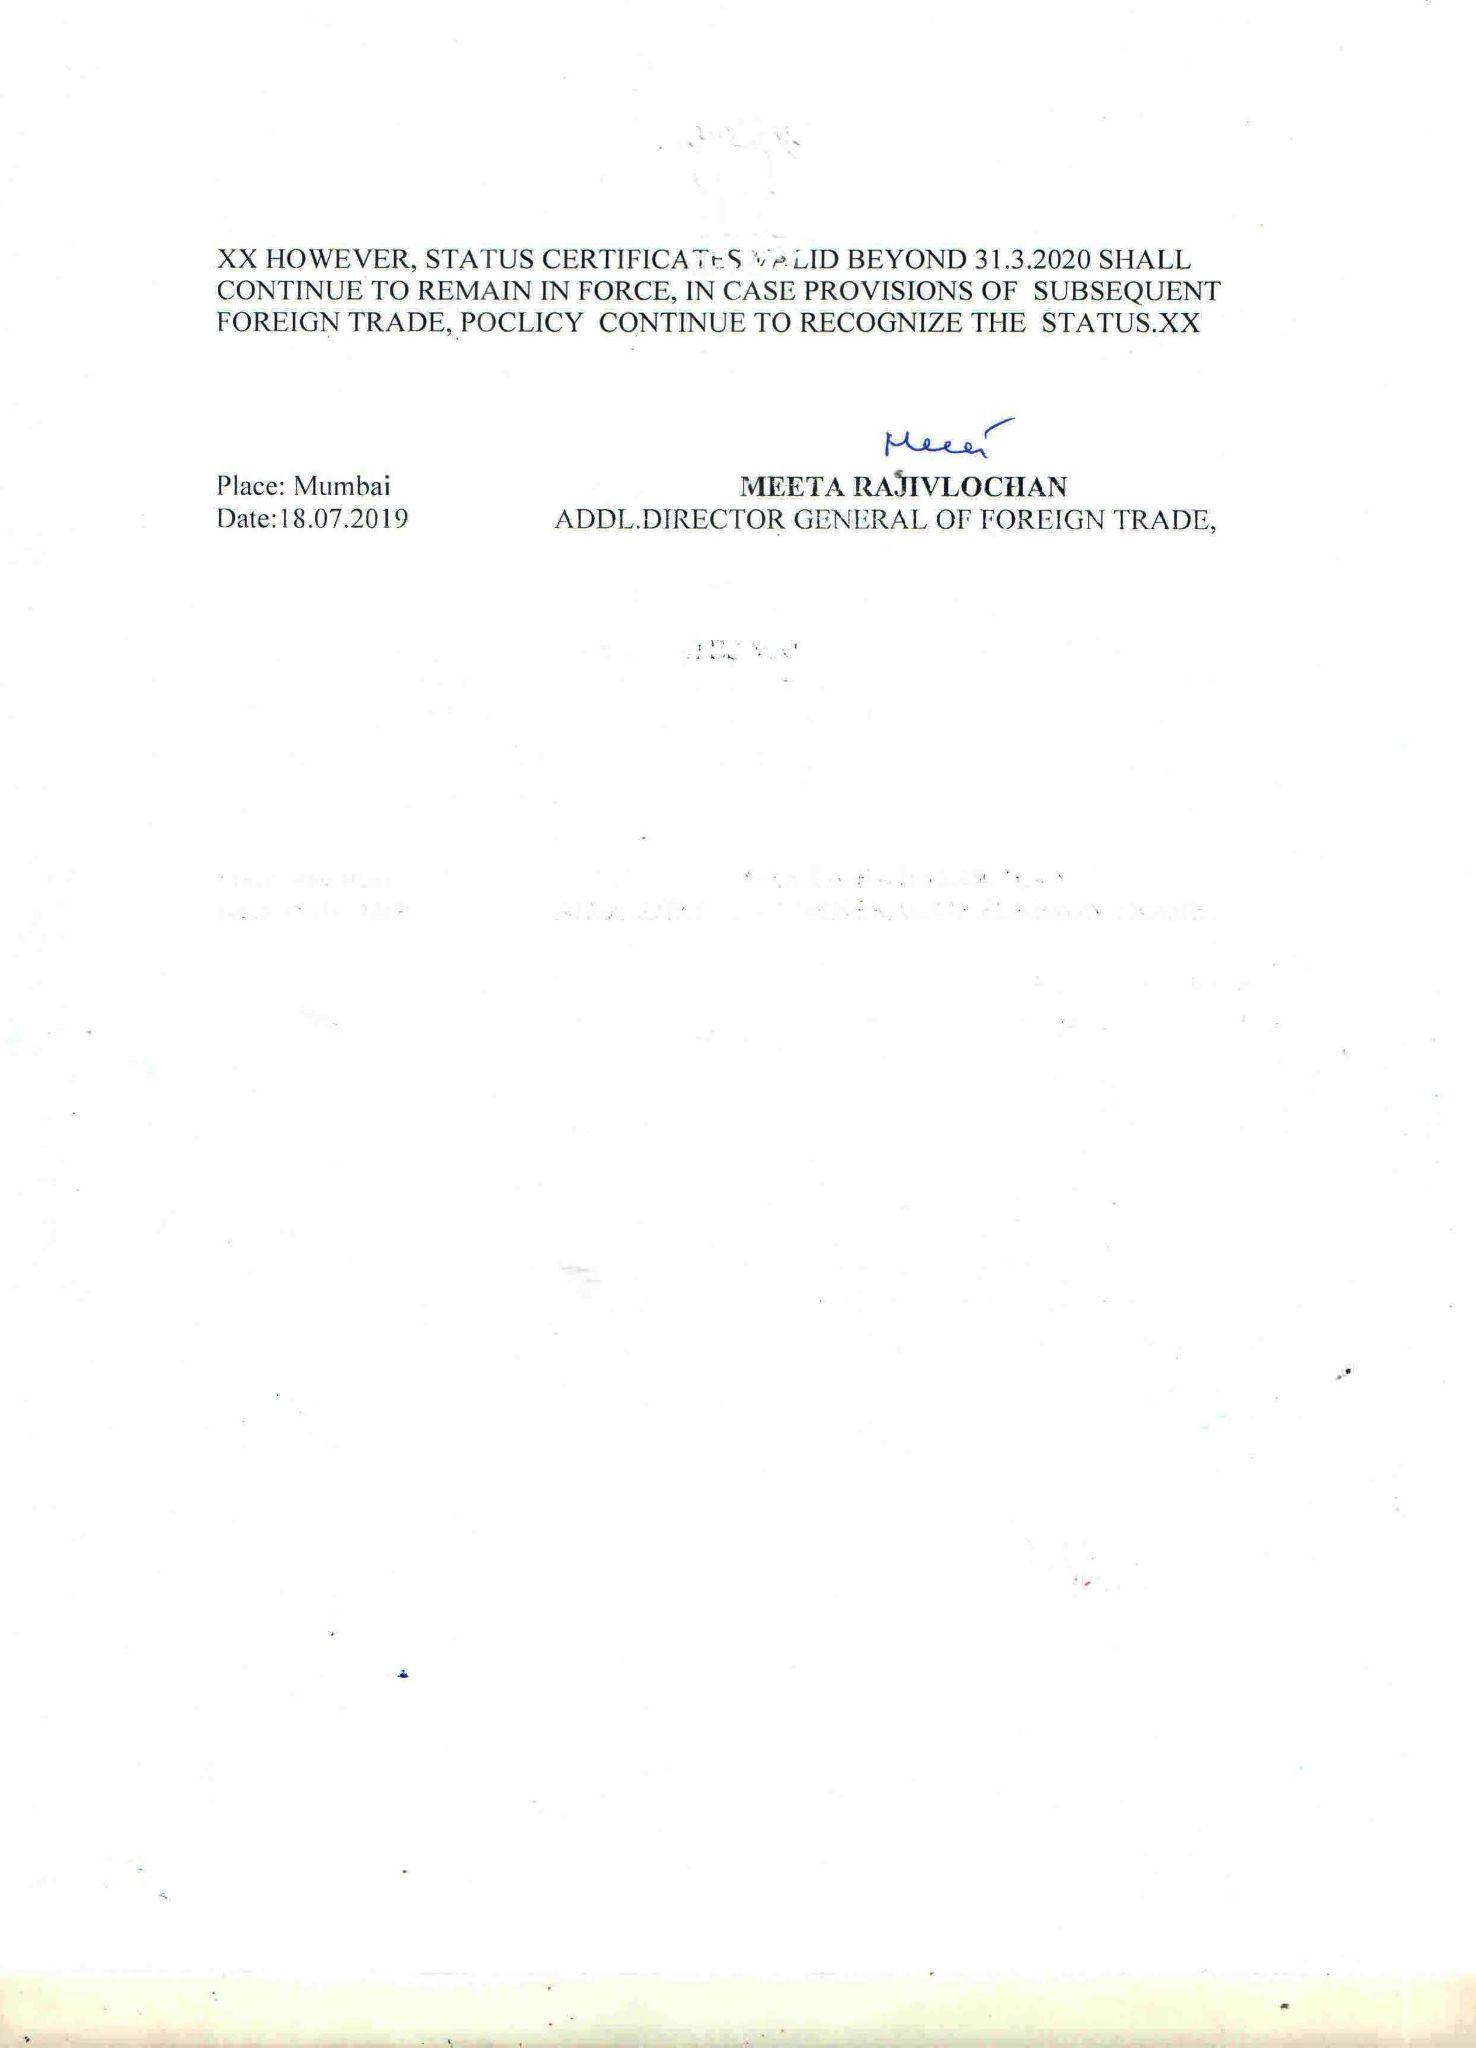 inox-certificate